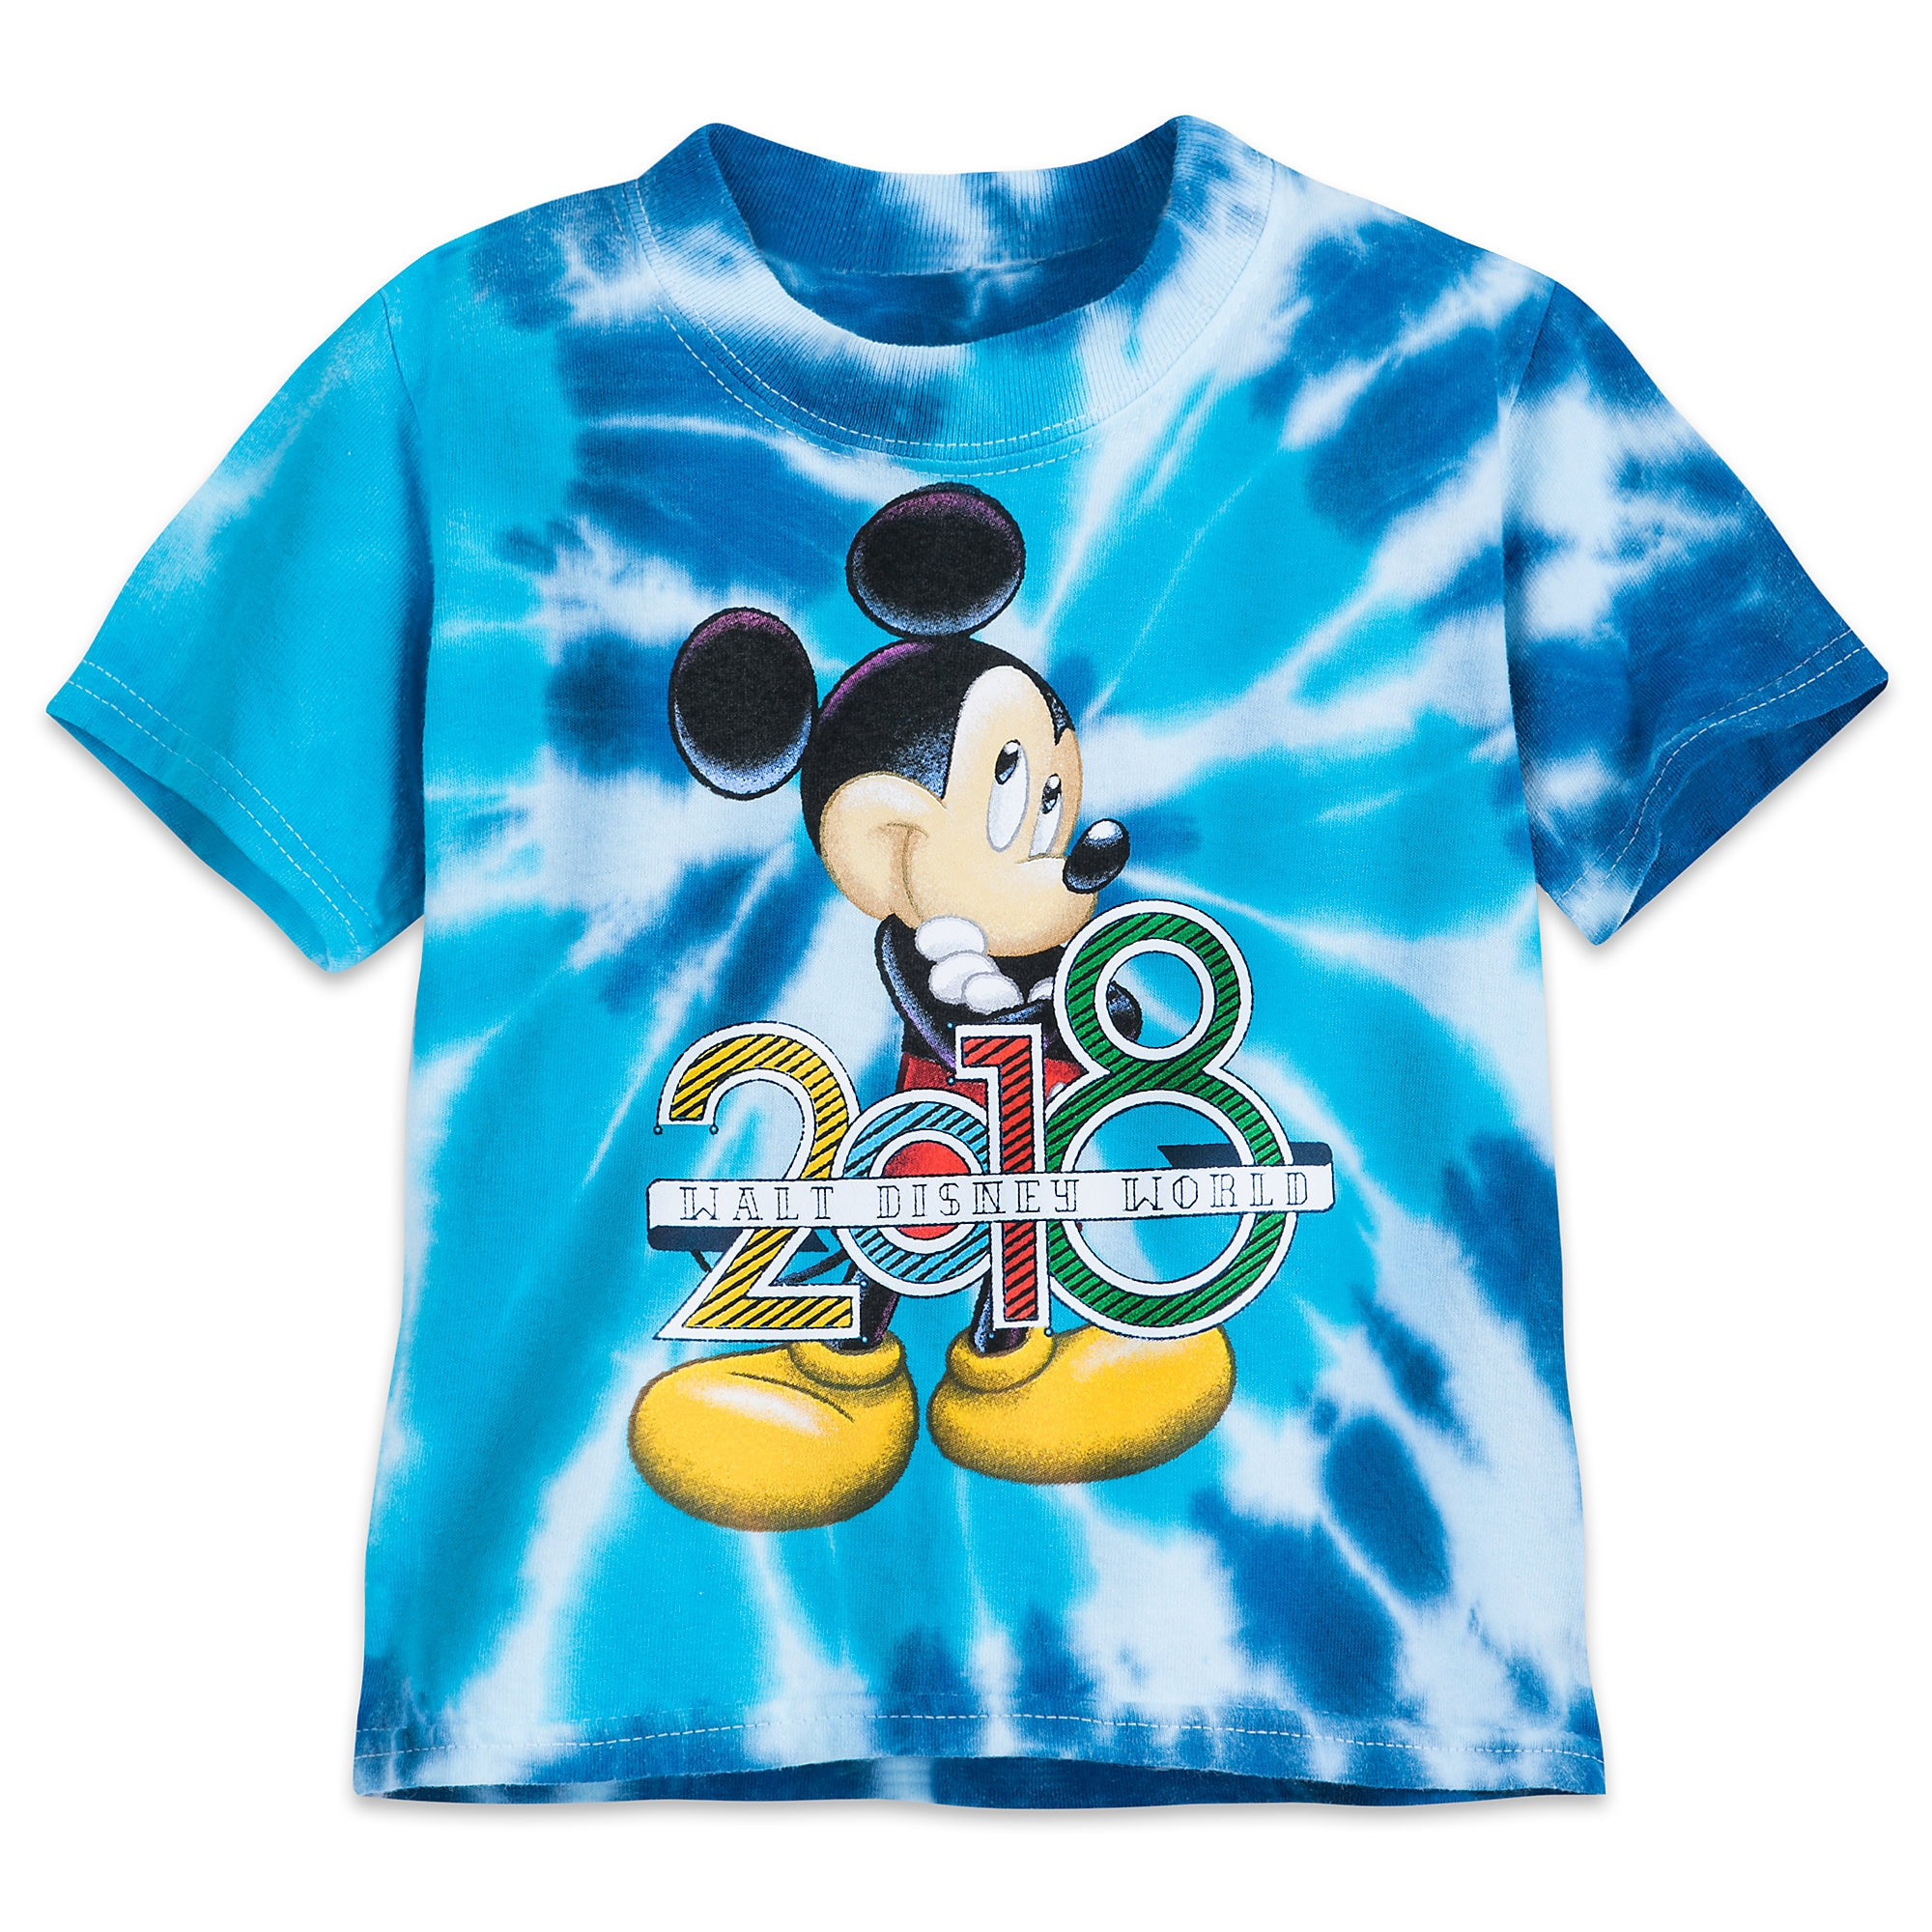 Mickey Mouse Tie Dye T Shirt for Kids Walt Disney World 2018